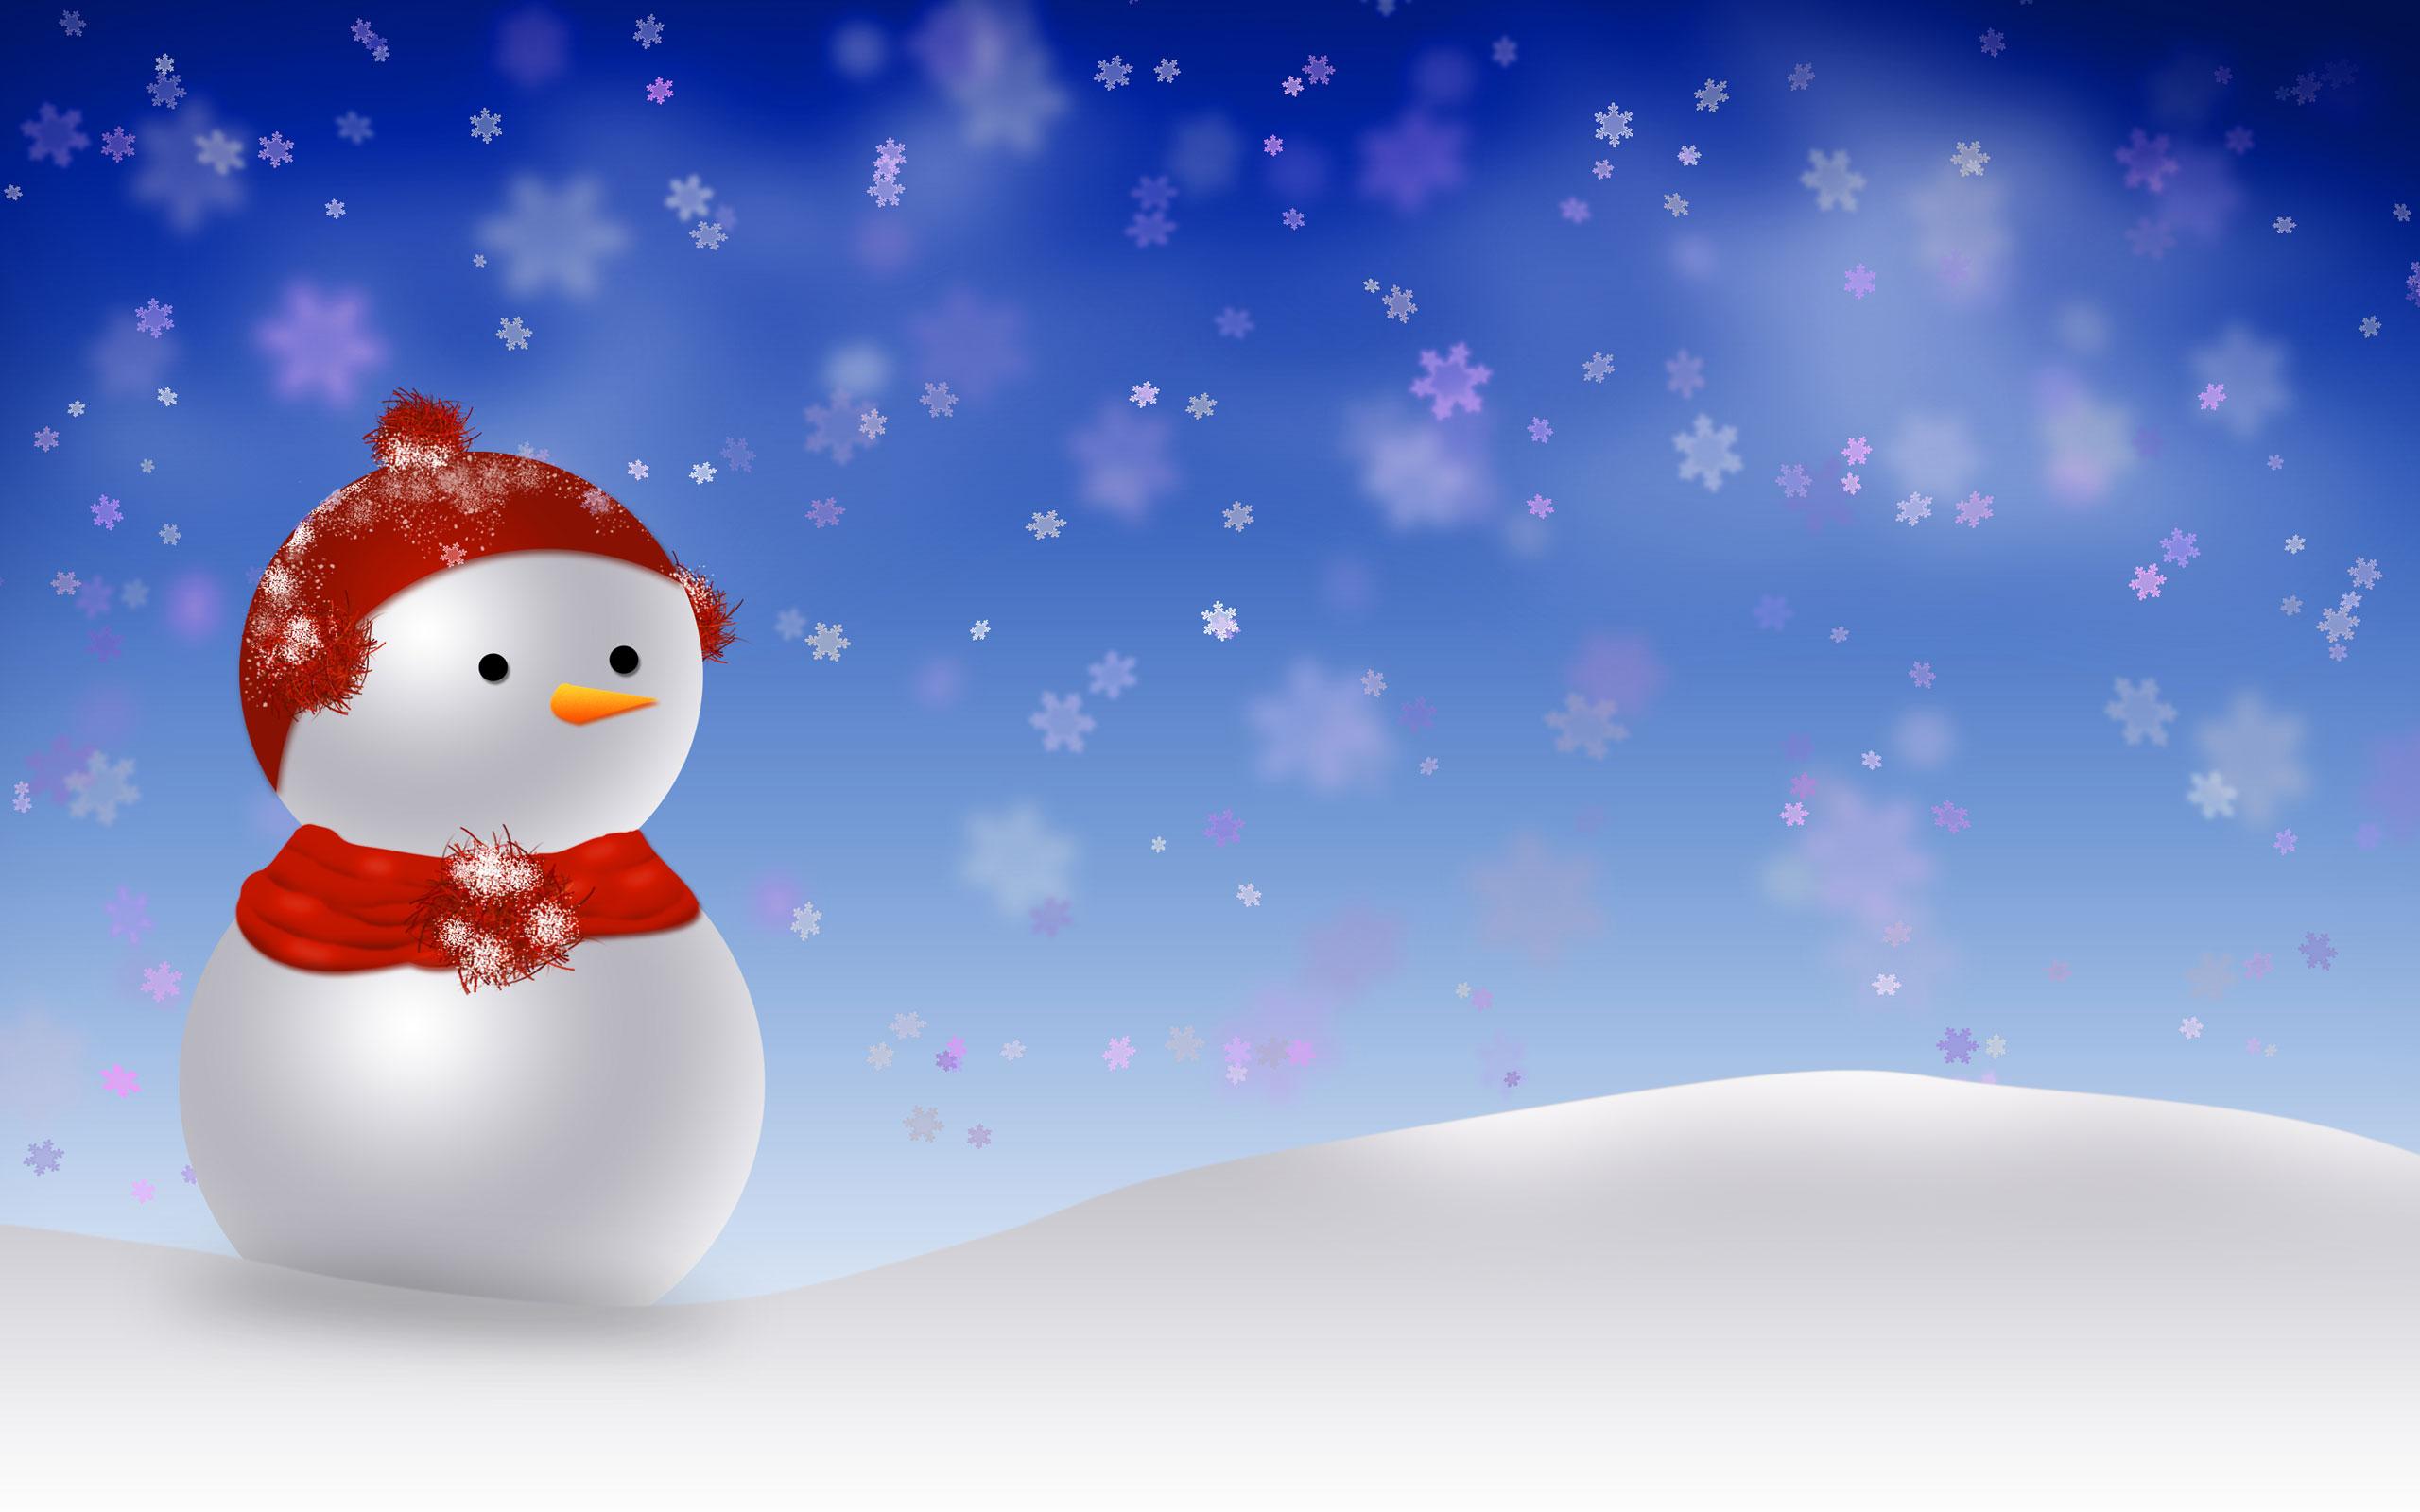 Backgrounds Cute Christmas Desktop Backgrounds Desktop 2560x1600